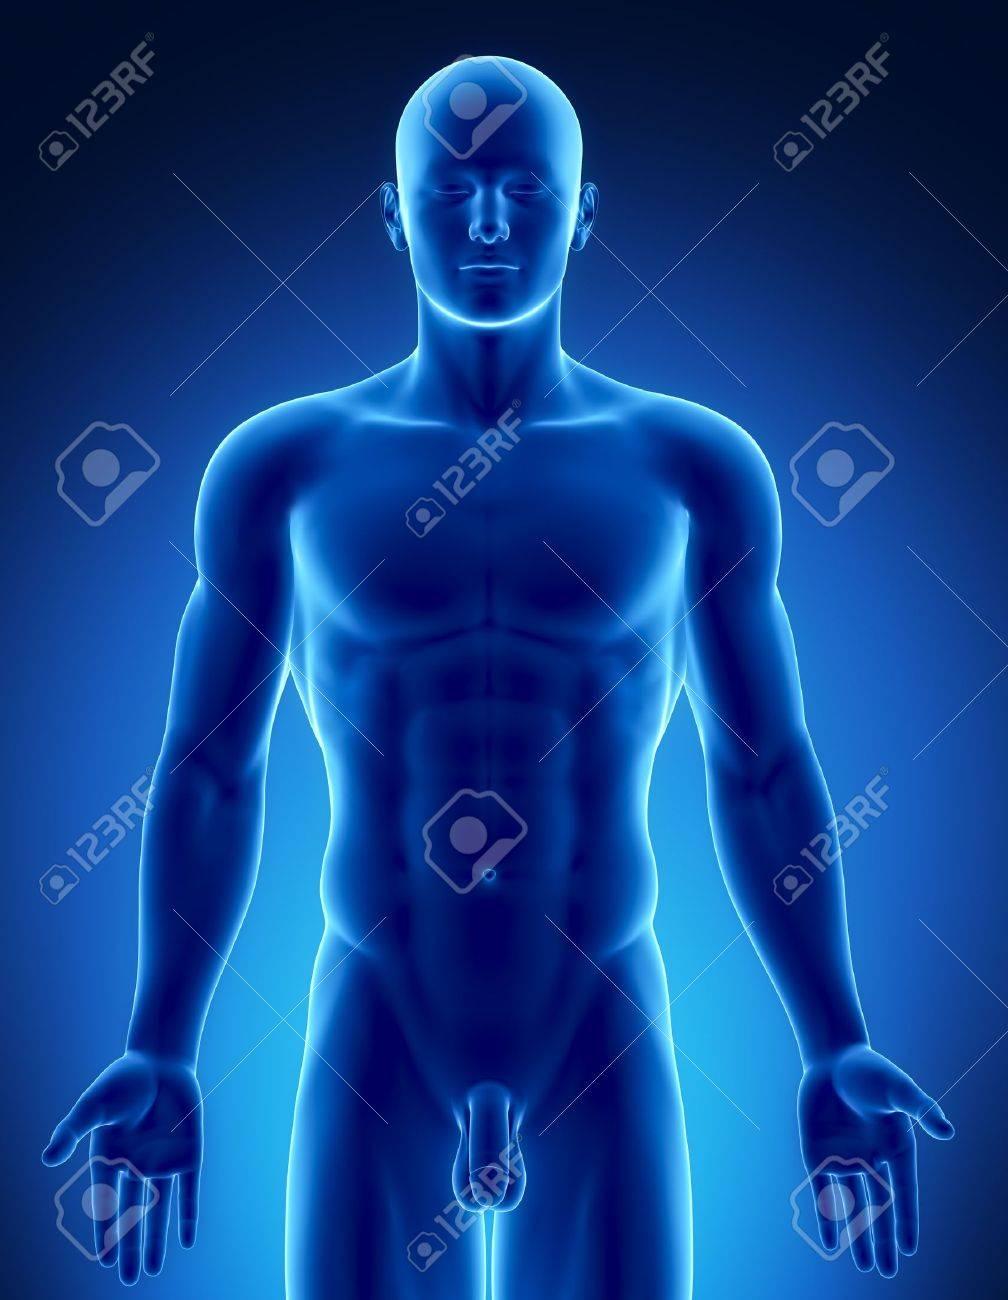 Anatomía Masculina De órganos Humanos En Vista De Rayos X Fotos ...